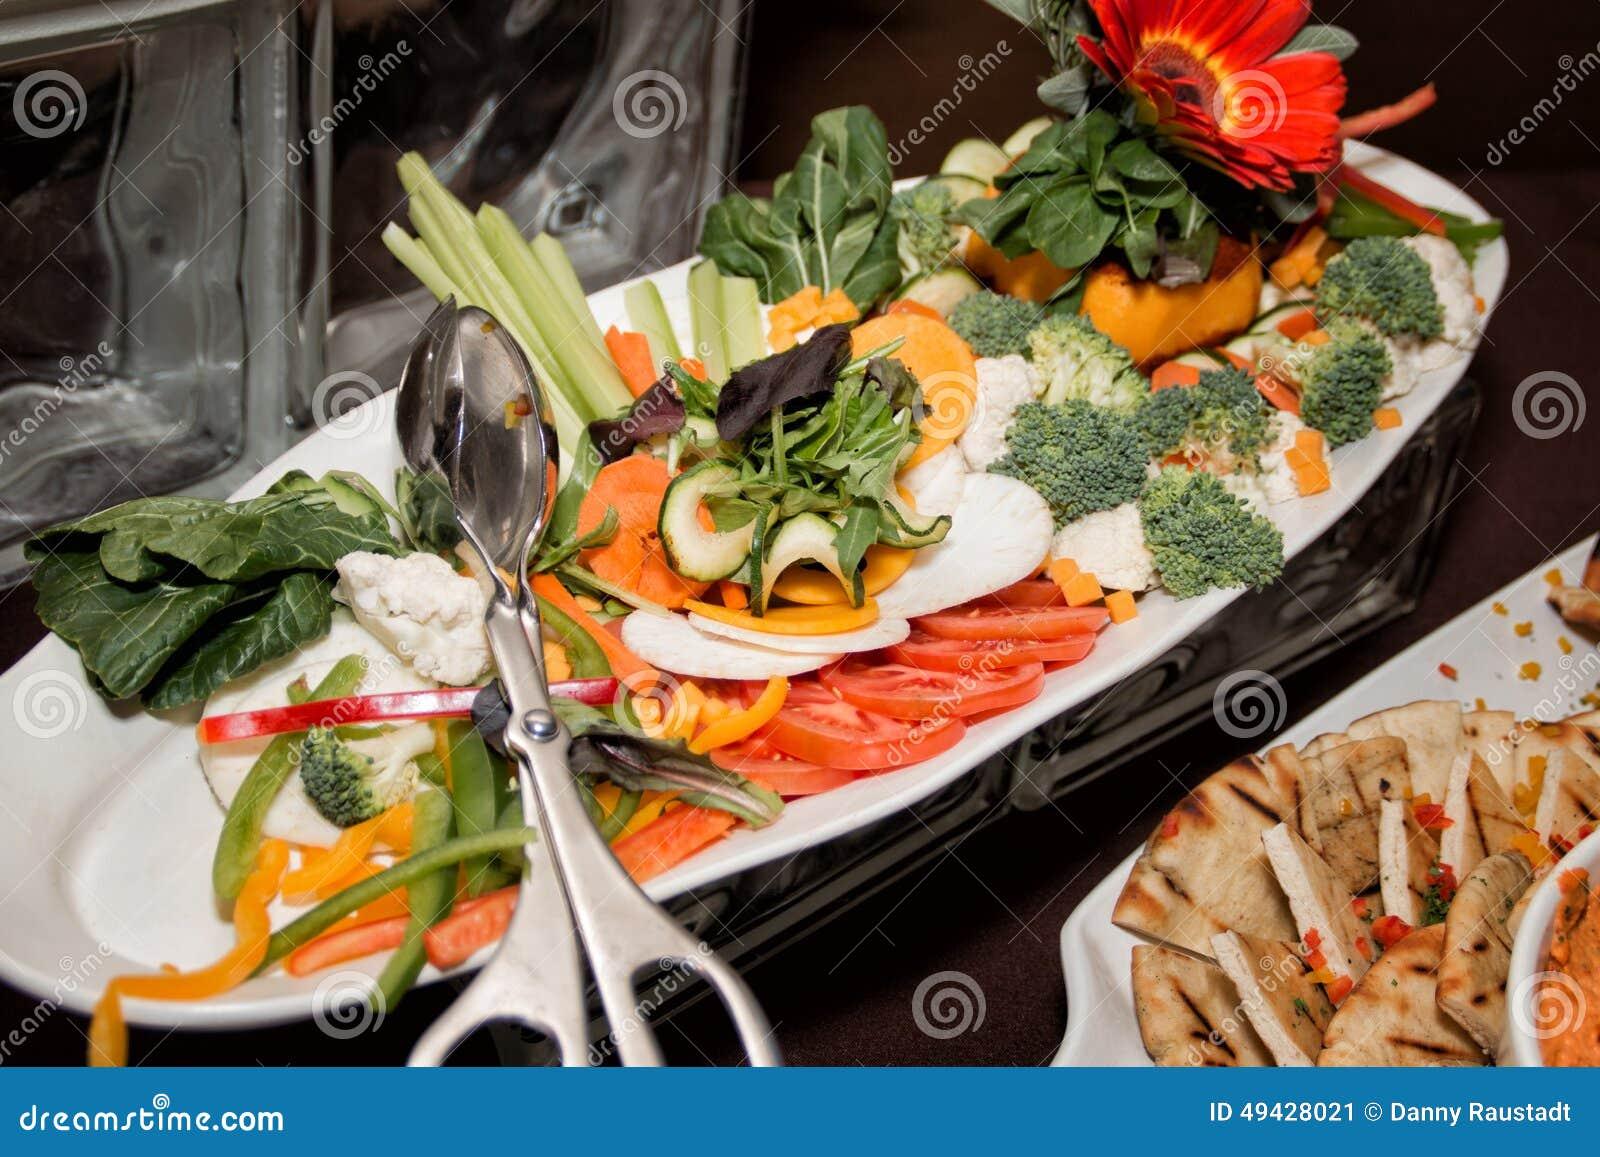 Fine Dining Restaurant Dinner Salad Buffet Stock Photo Image 49428021